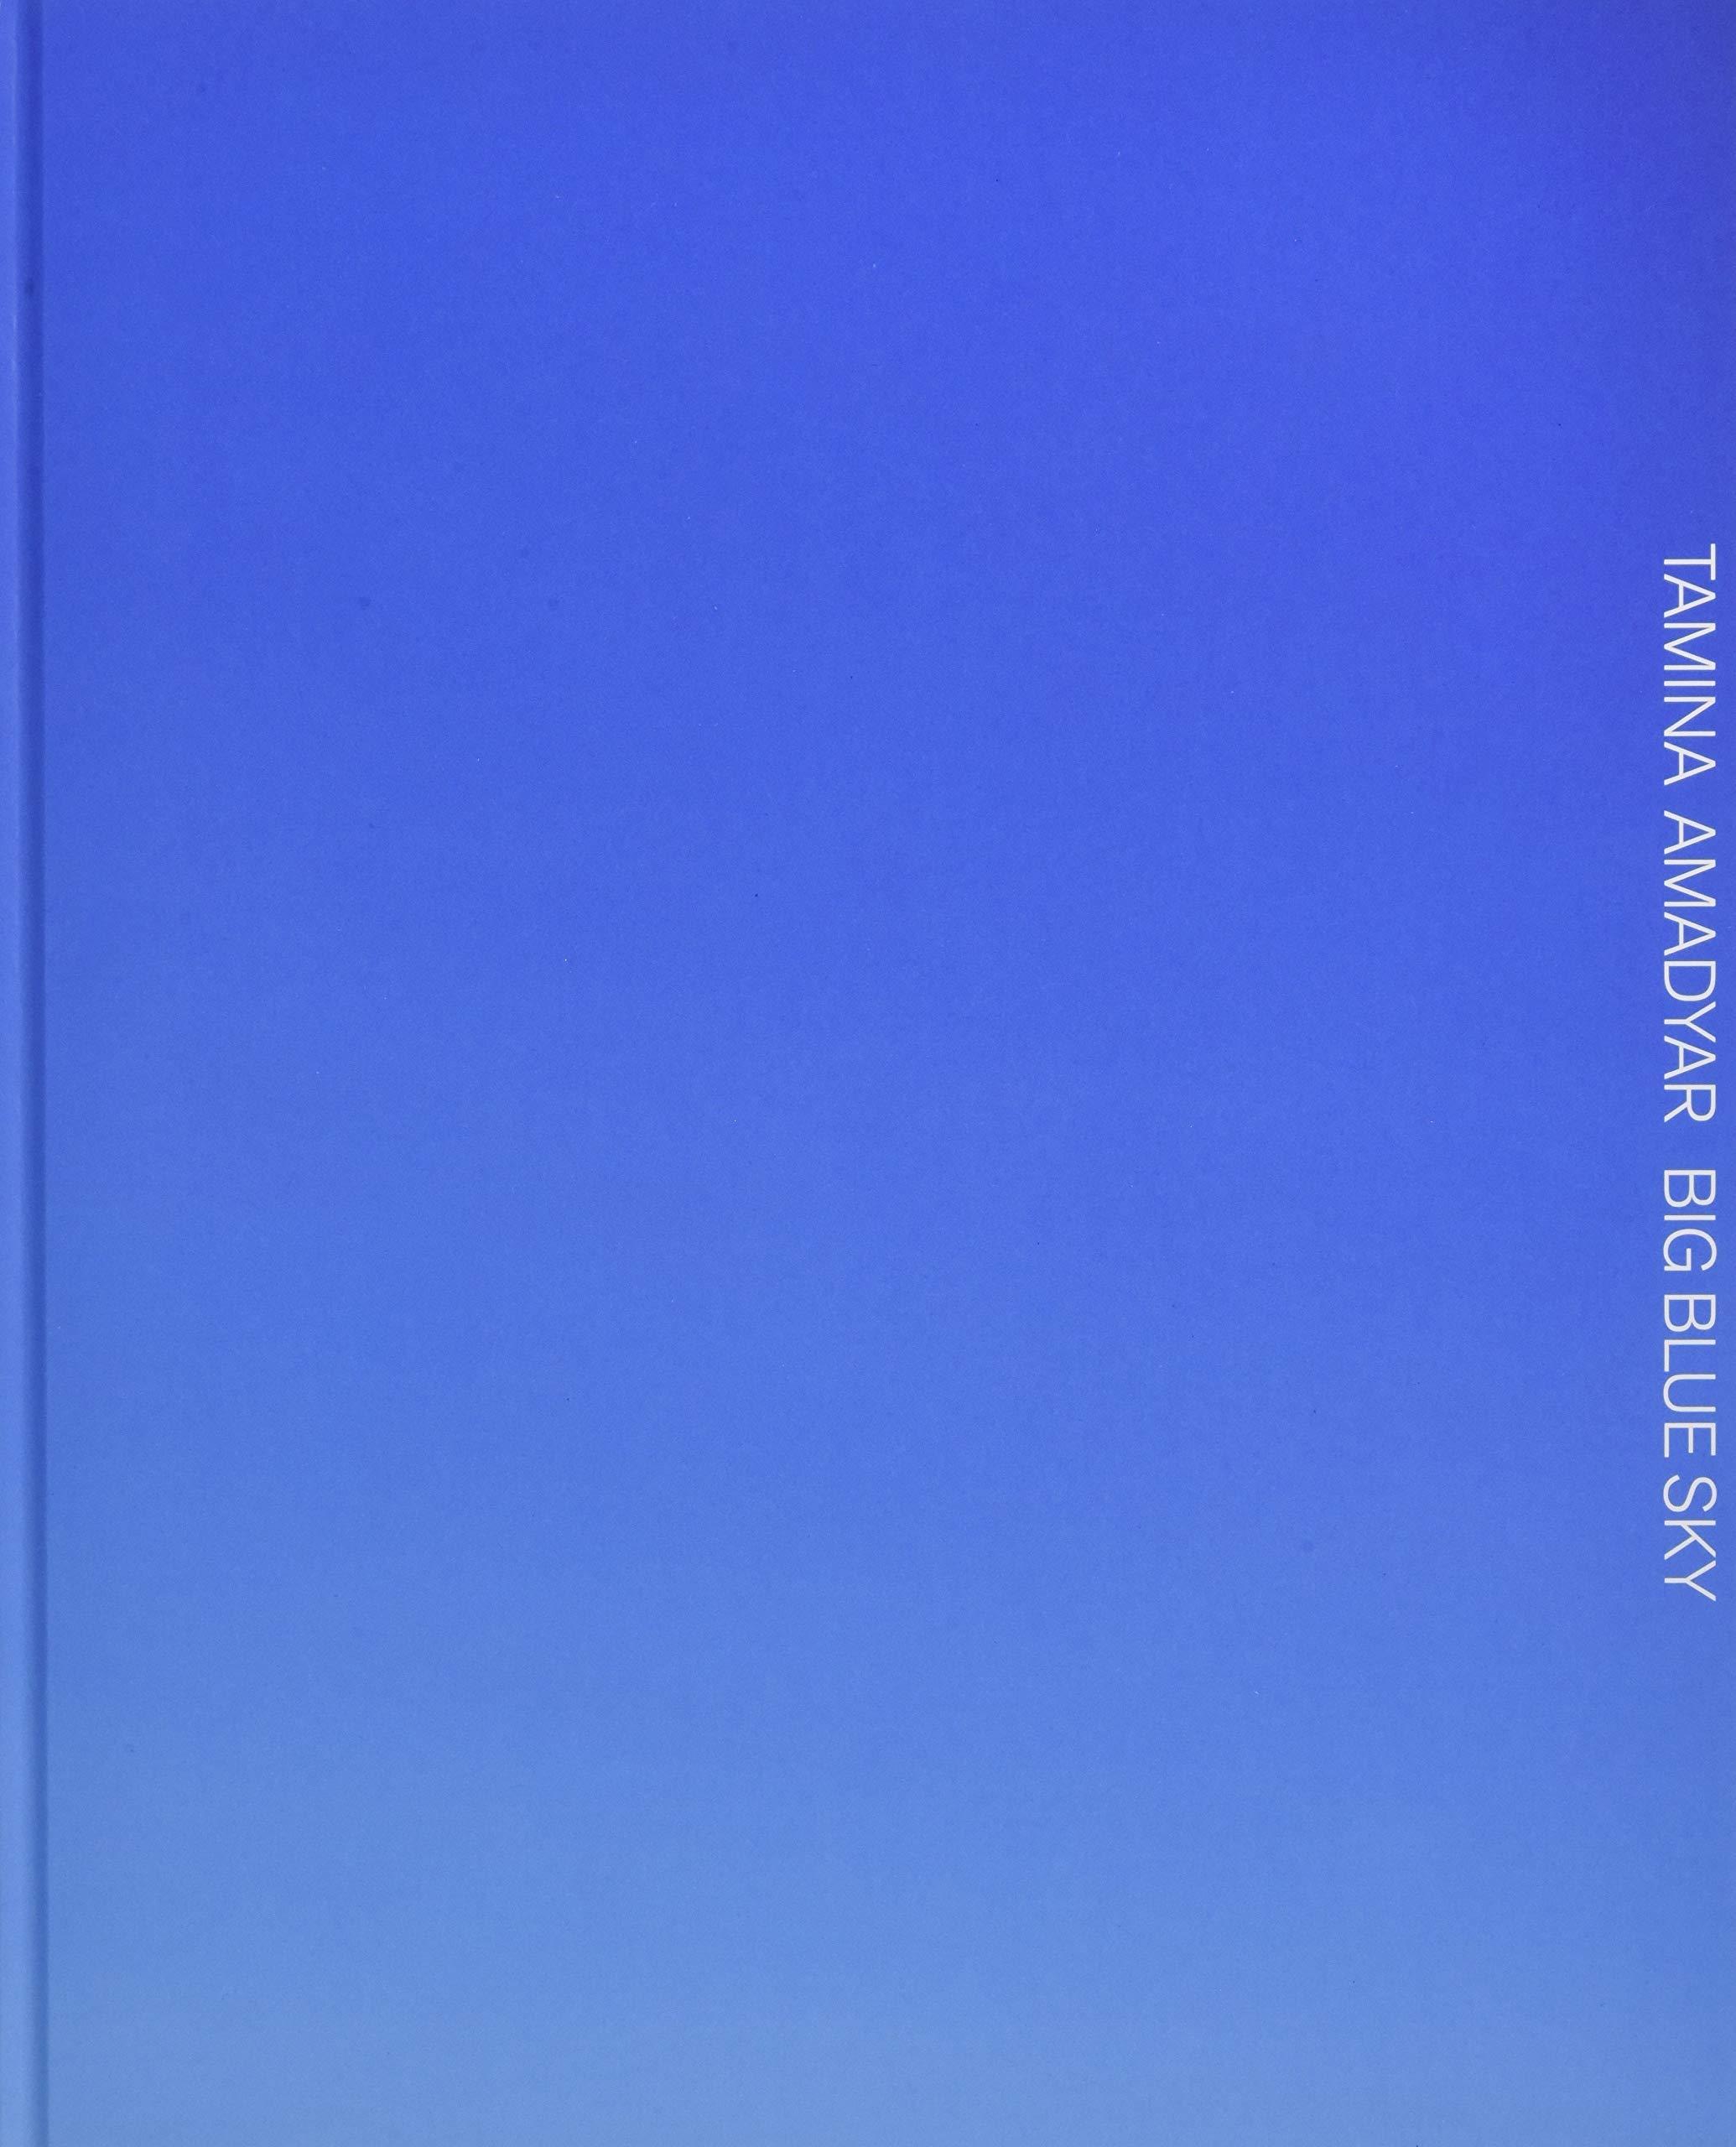 Tamina Amadyar. Big Blue Sky: Ausst. Kat. Kunstverein Reutlingen, 2018